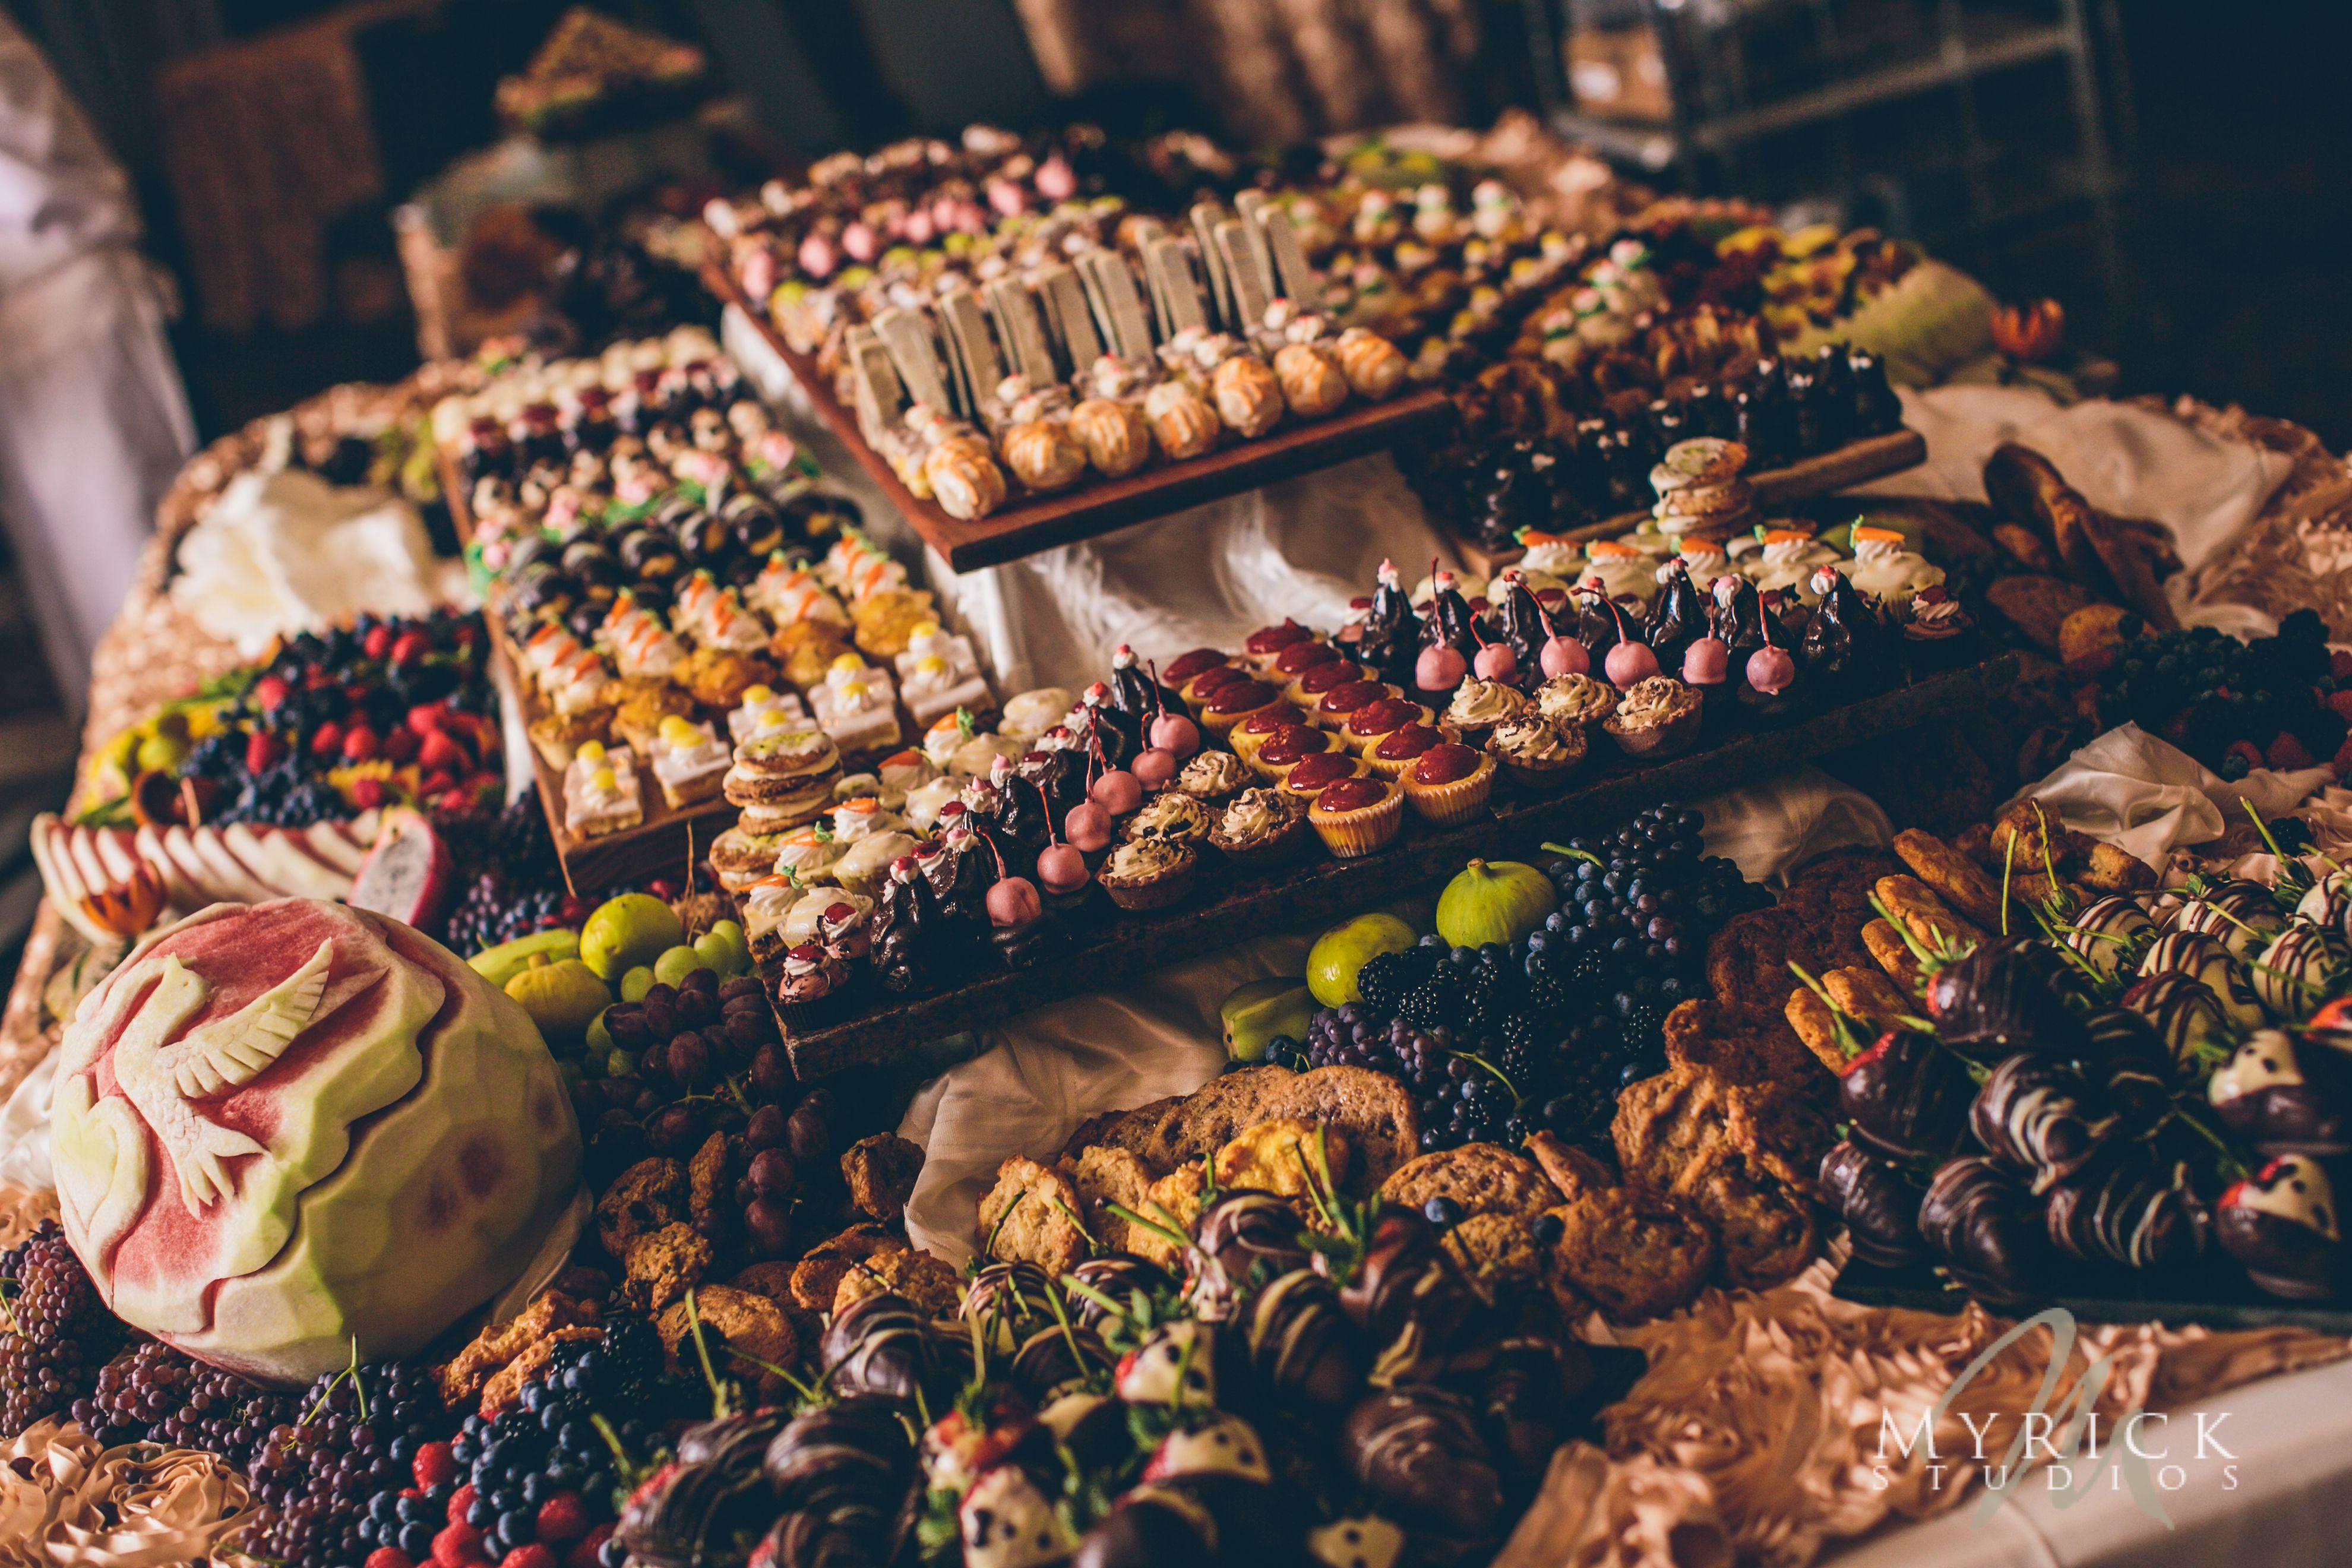 Beautiful meadow brook hall sweets display food displays